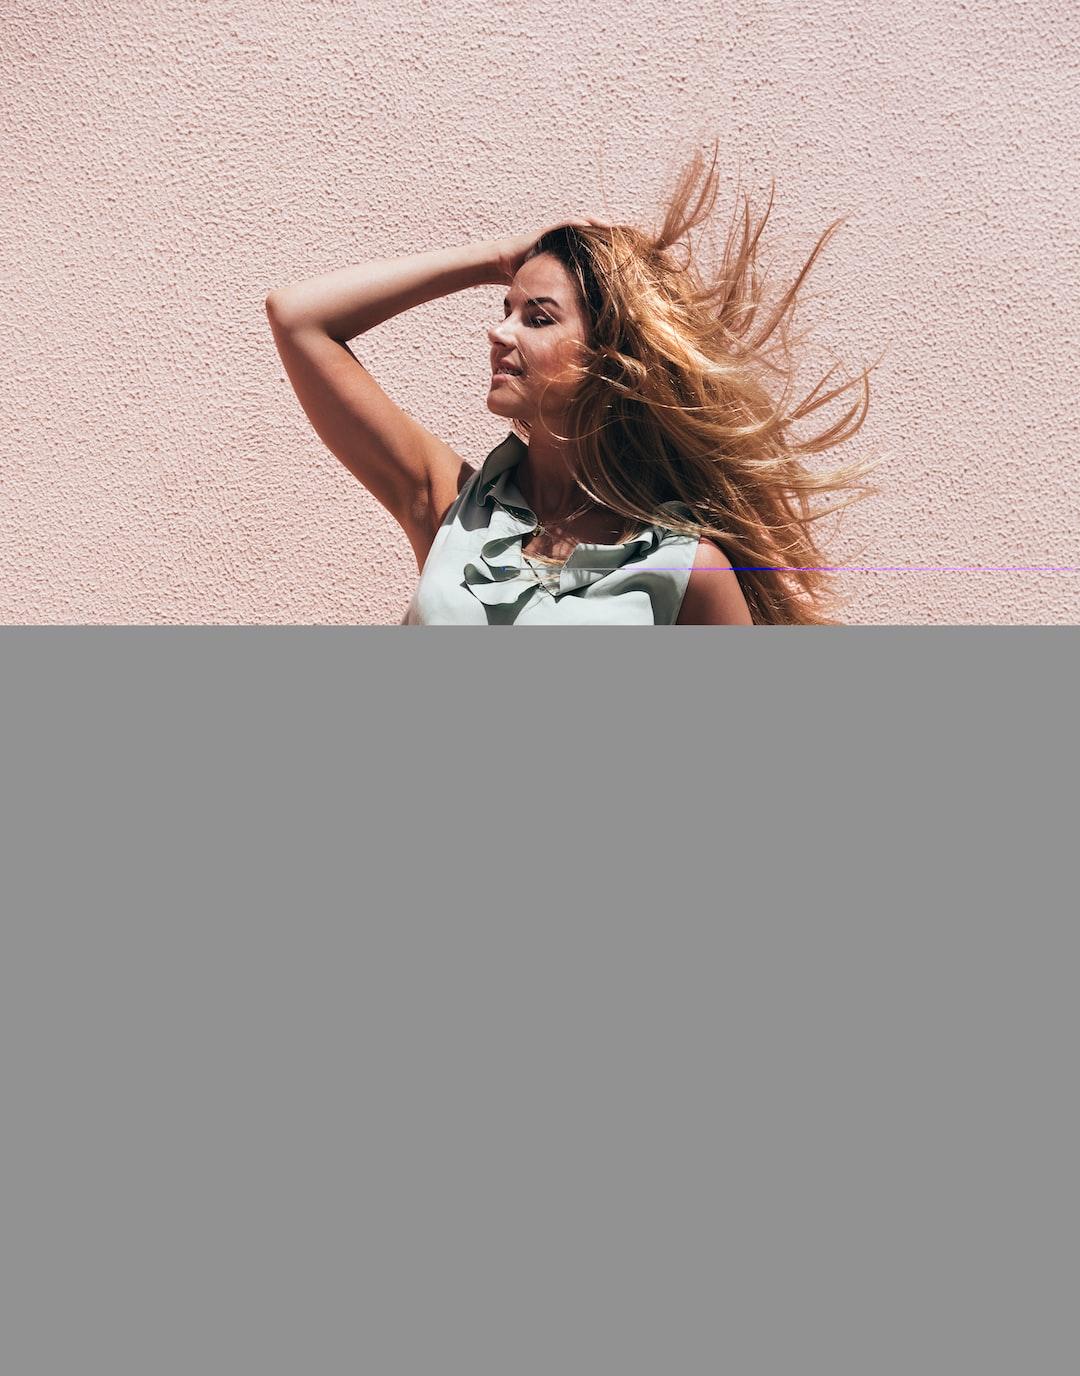 Beautiful woman with windy hair. It's summer in Portugal. Photo by Toni Hukkanen. Model: @anihukkanen